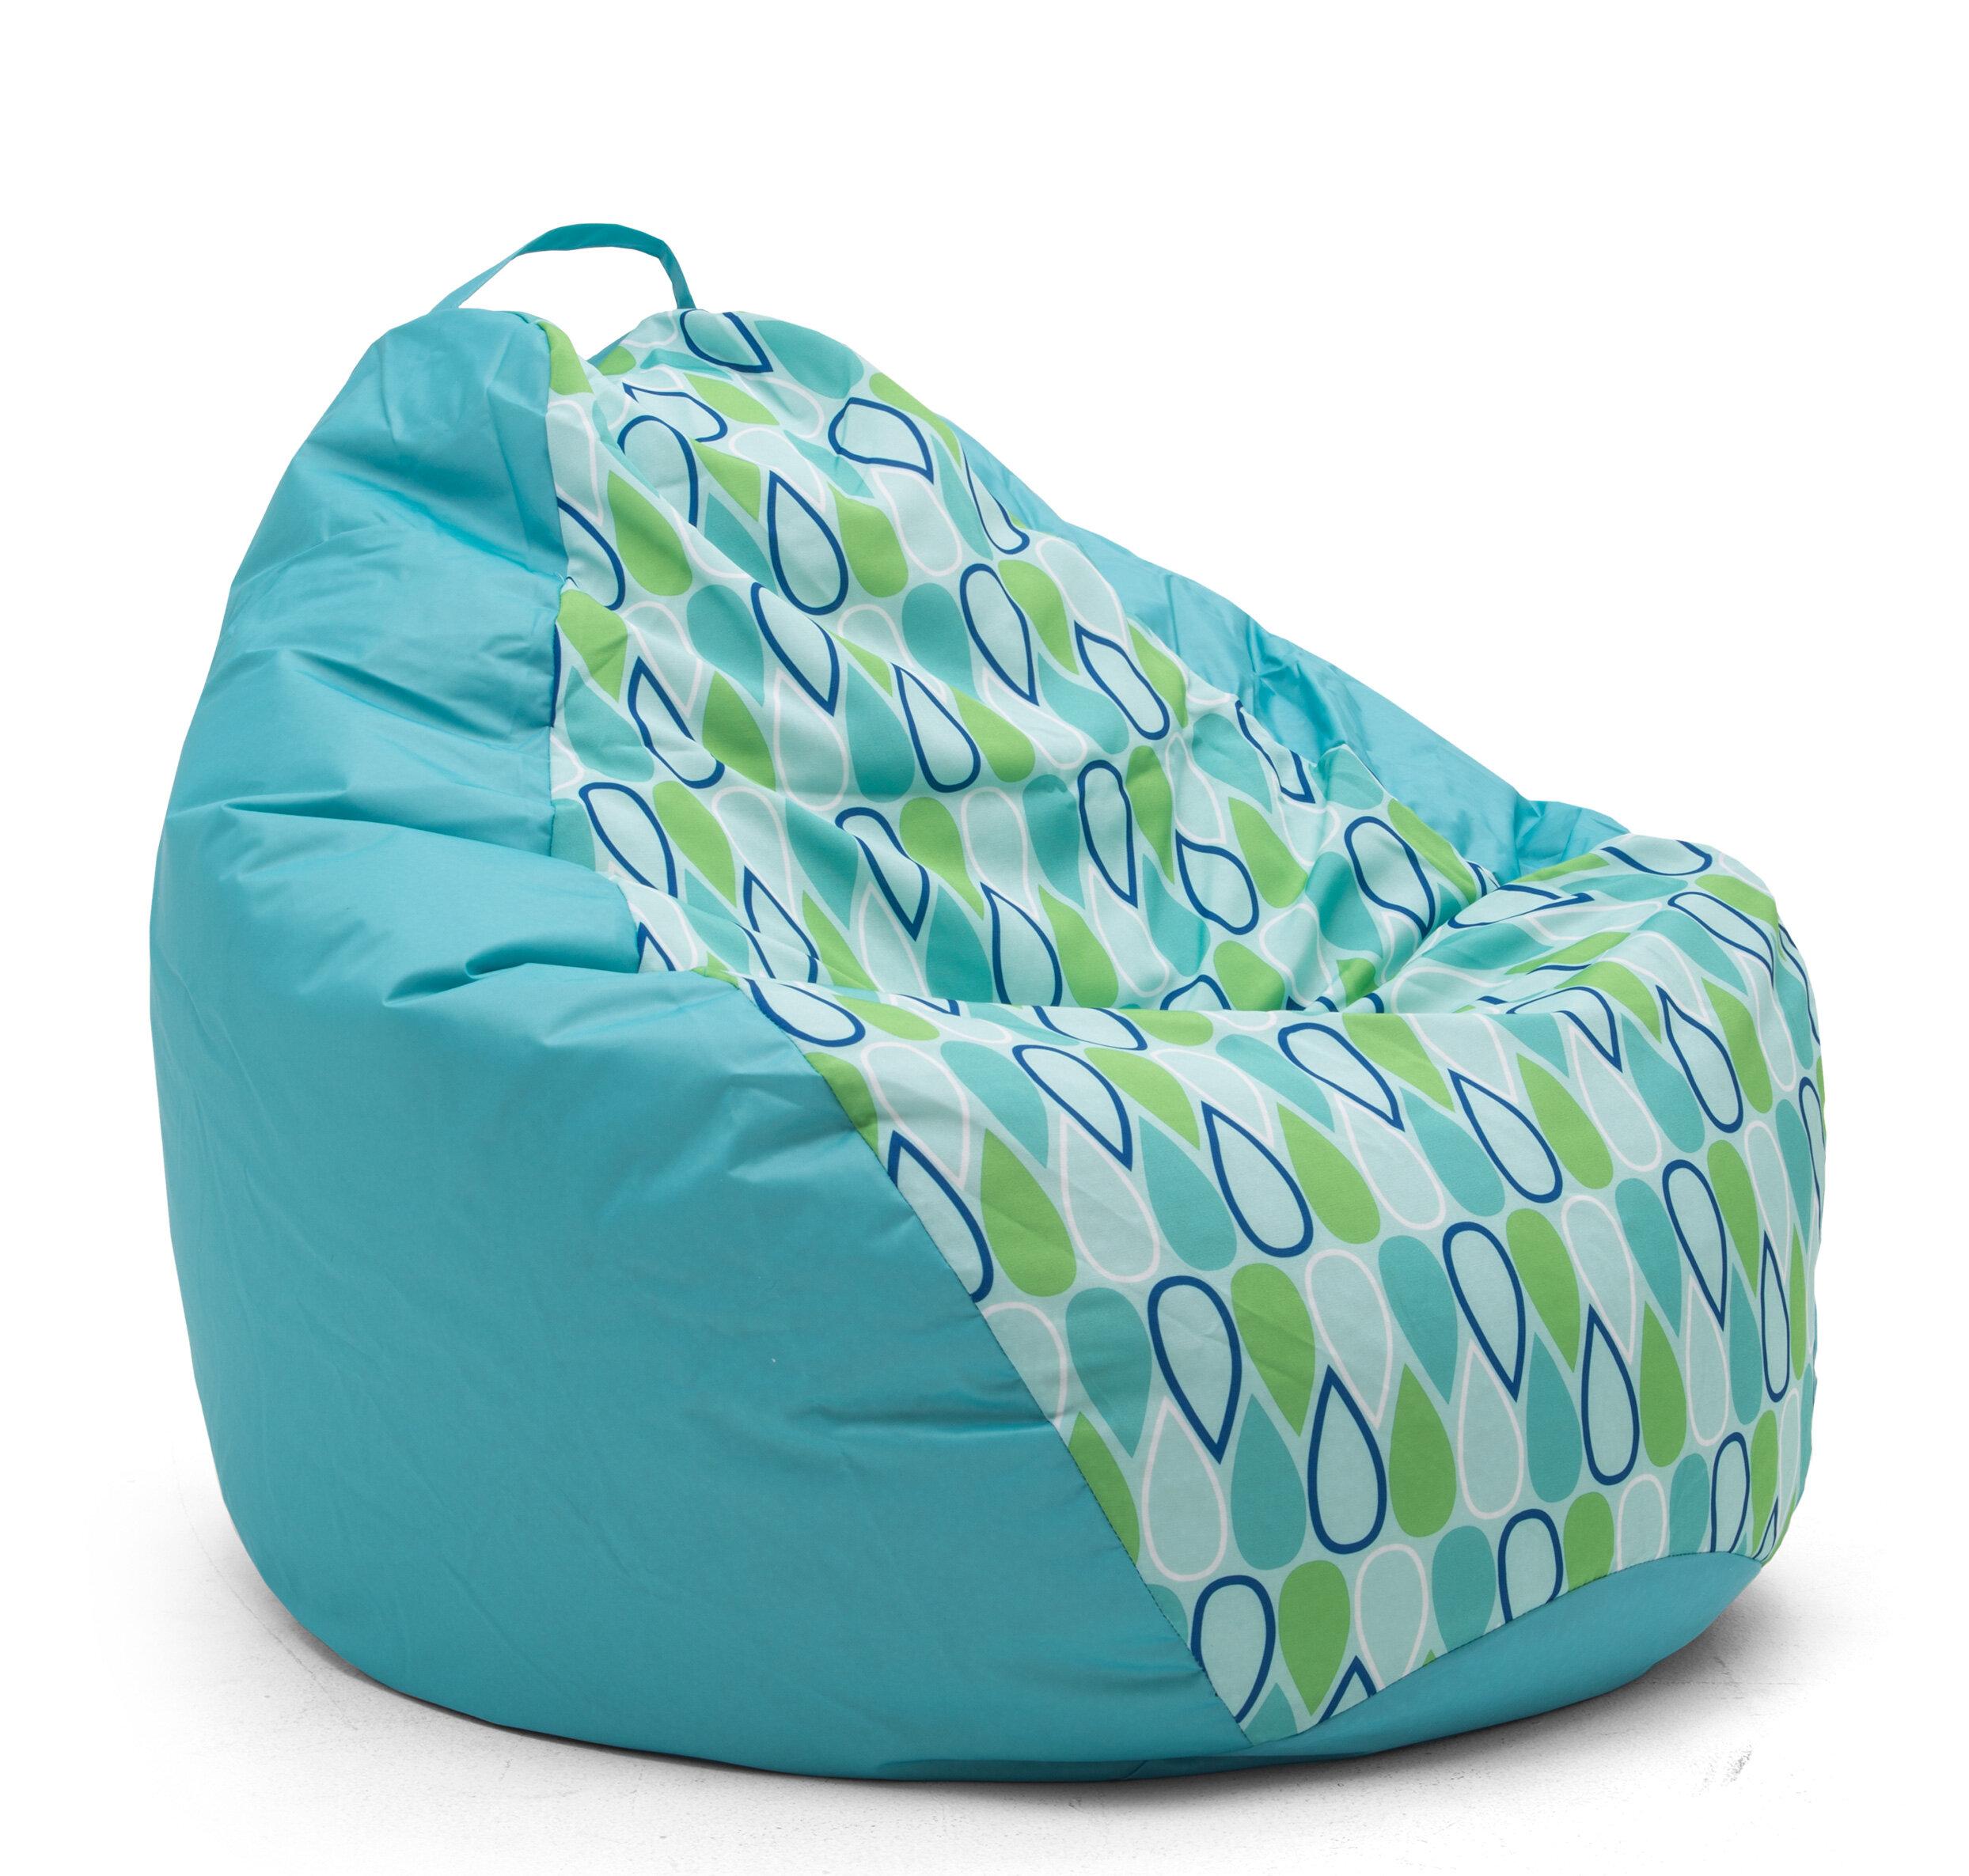 Comfort Research Big Joe Outdoor Teardrop Geo Drop Bean Bag Chair U0026 Reviews  | Wayfair